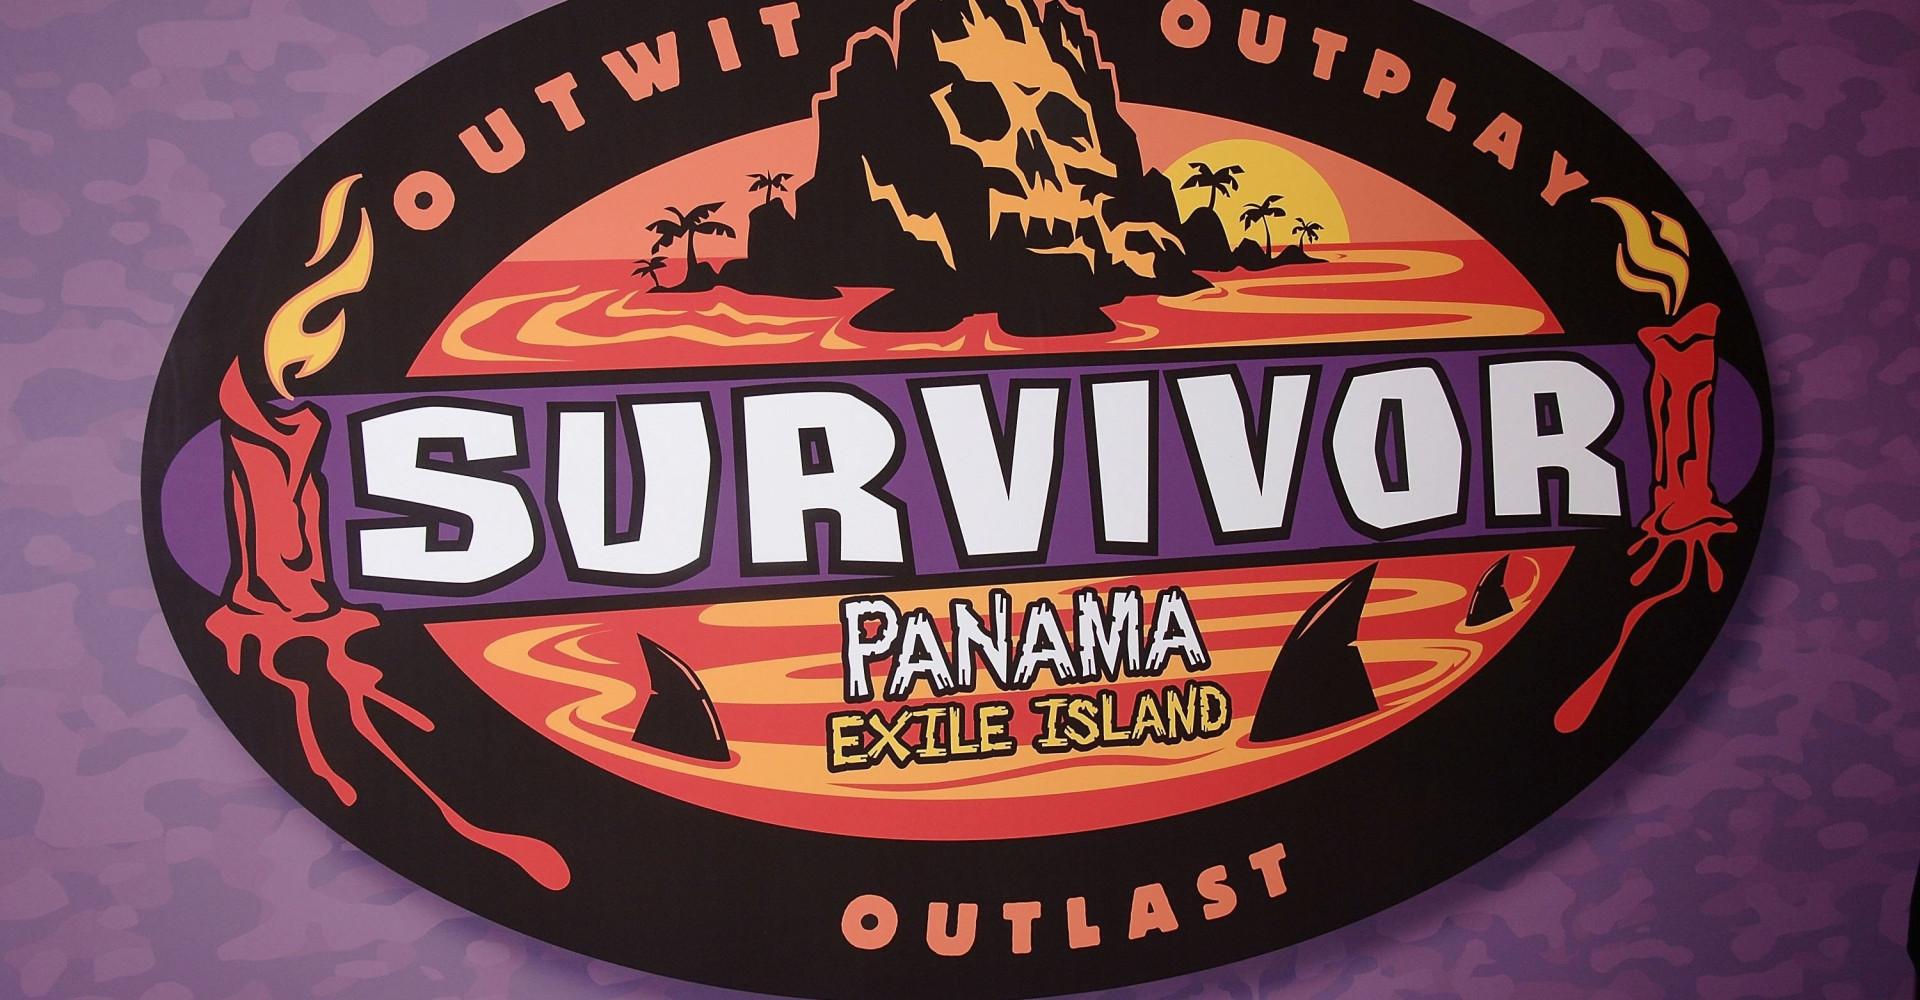 'Australian Survivor' contestant explodes in controversial rant